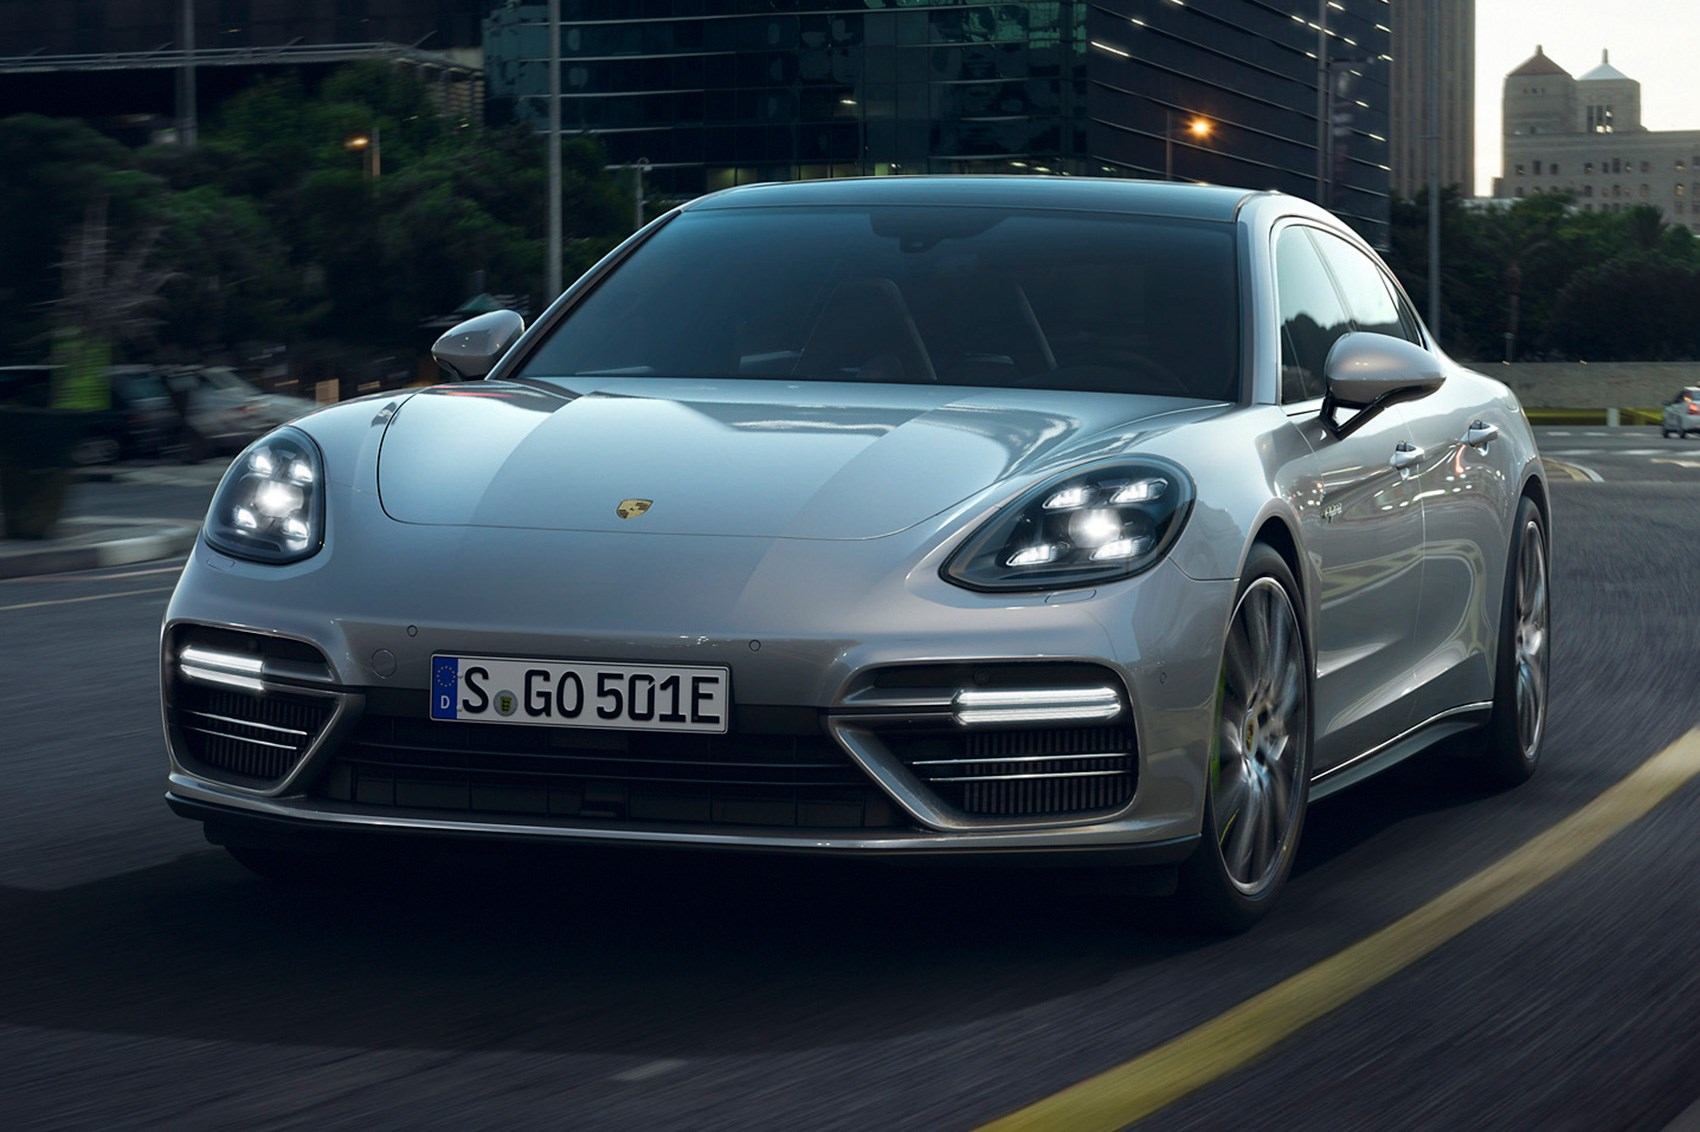 Porsche Panamera S E-Hybrid 3